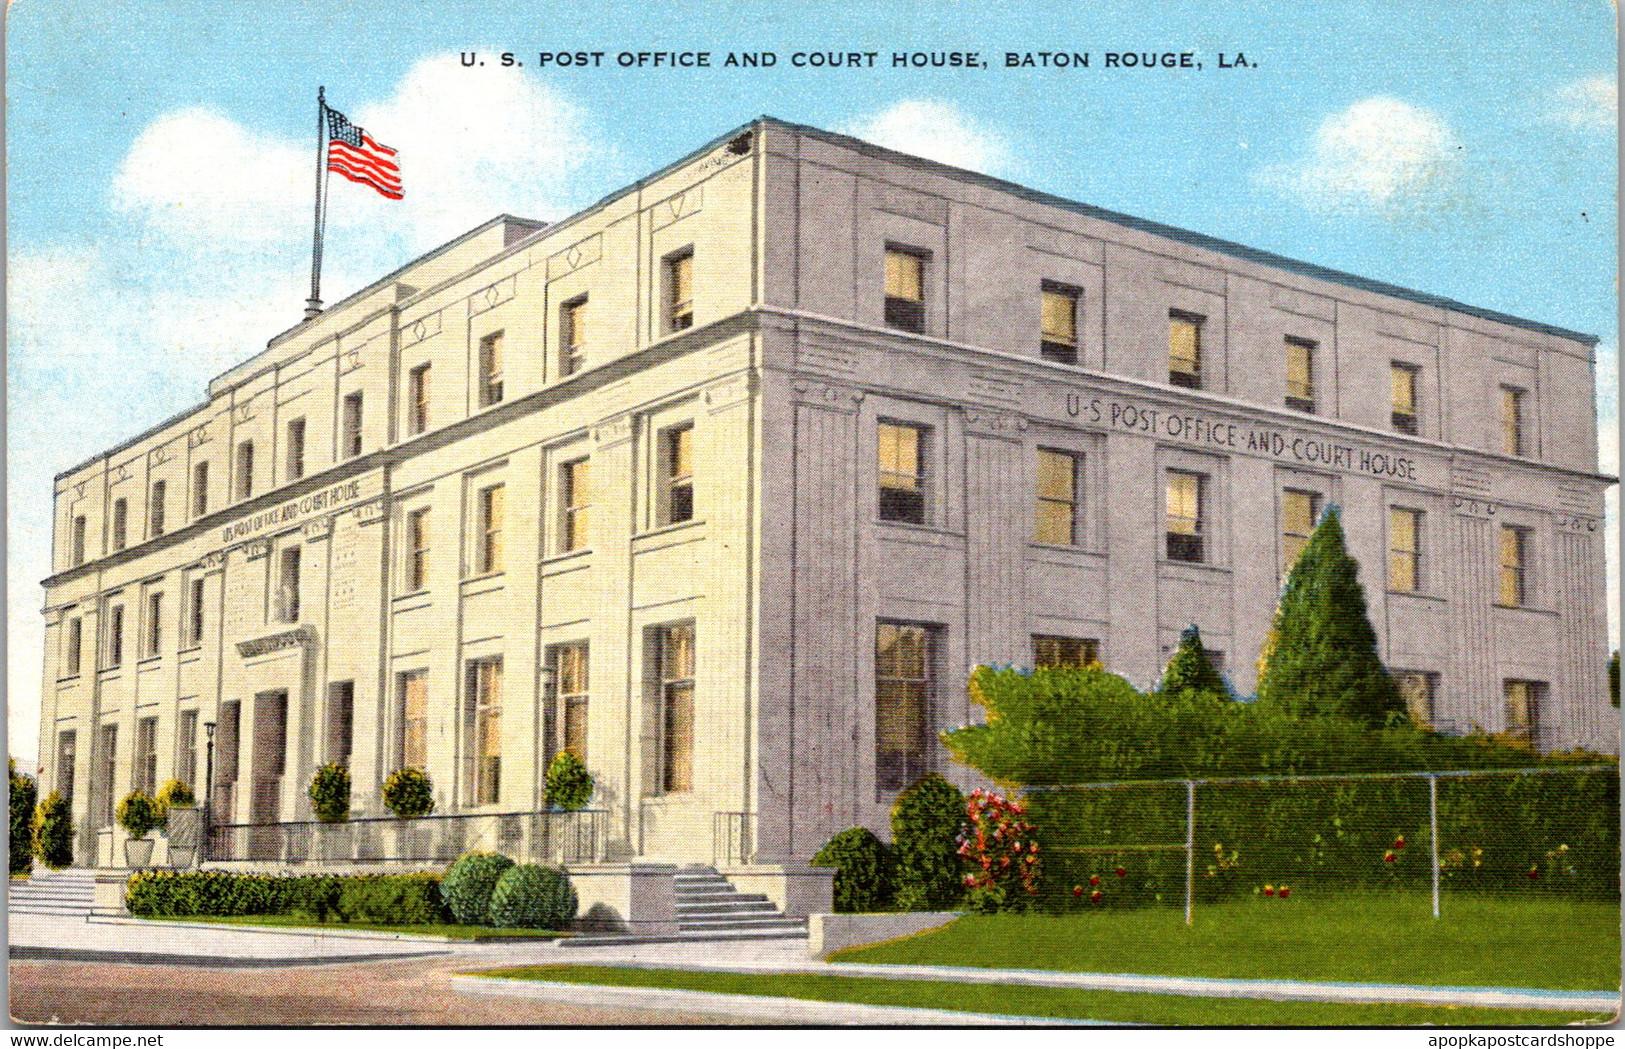 Louisiana Baton Rouge Post Office And Court House - Baton Rouge